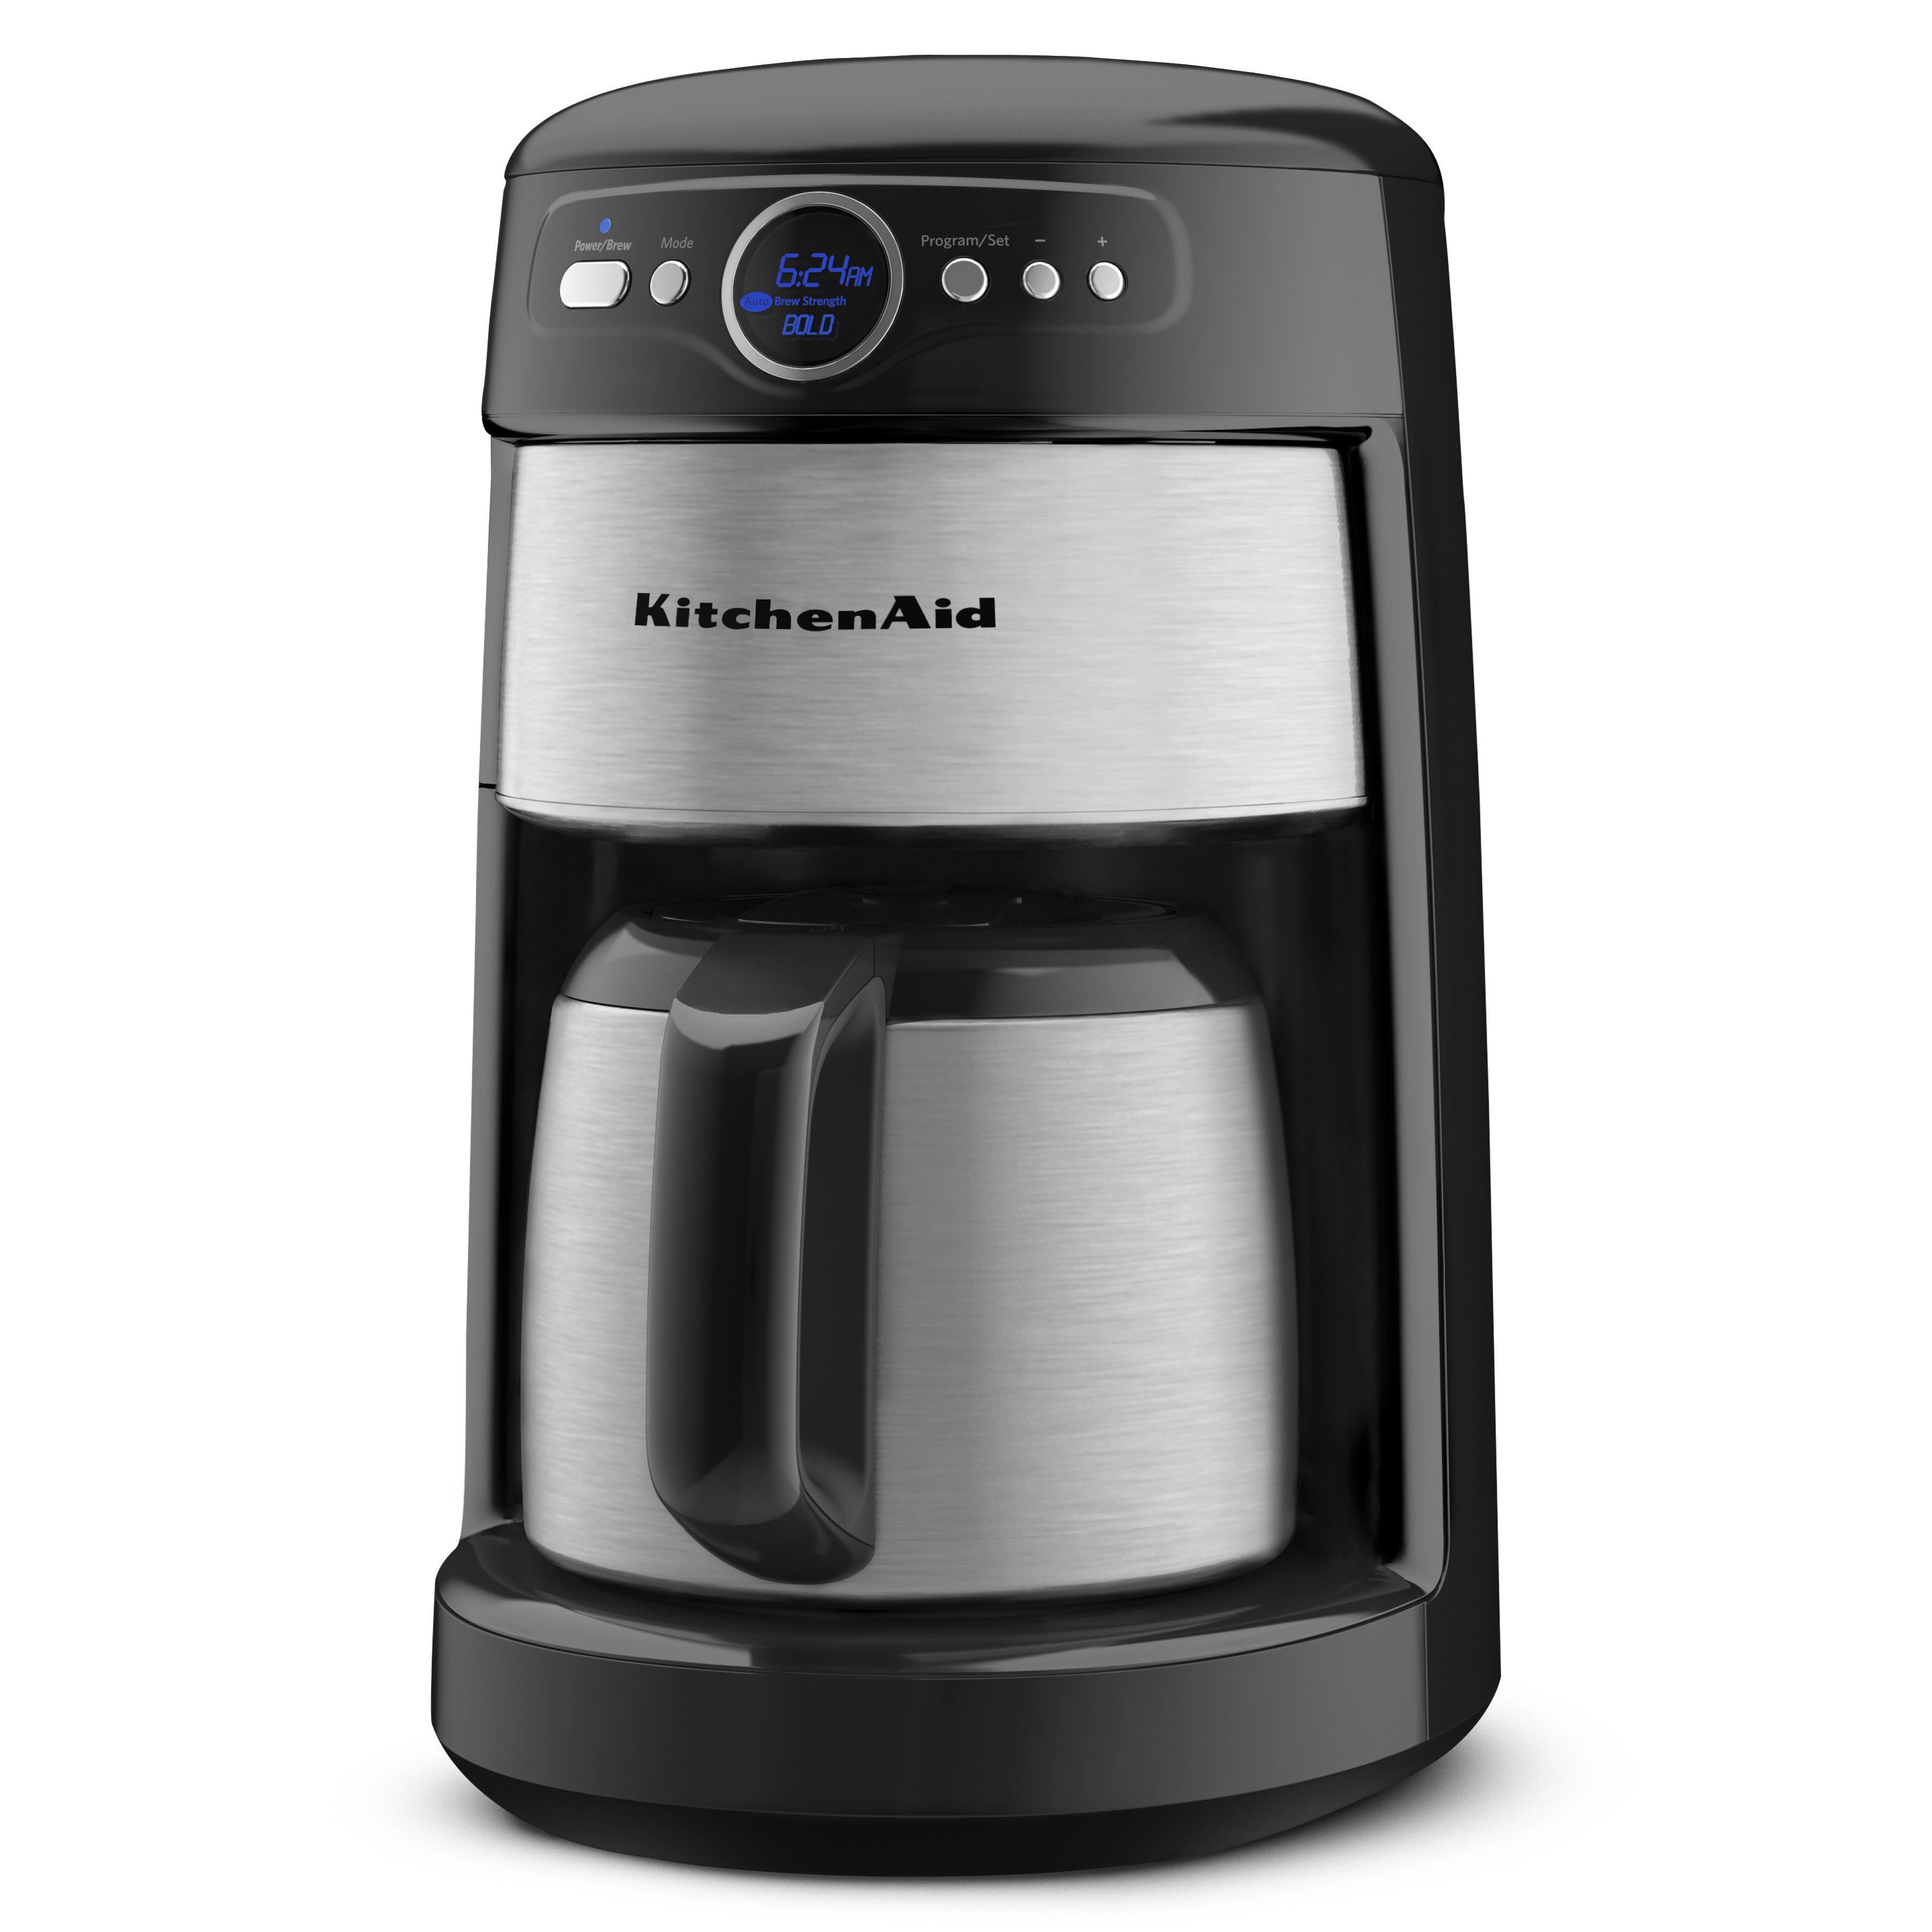 Kitchenaid thermal coffee maker photo - 3